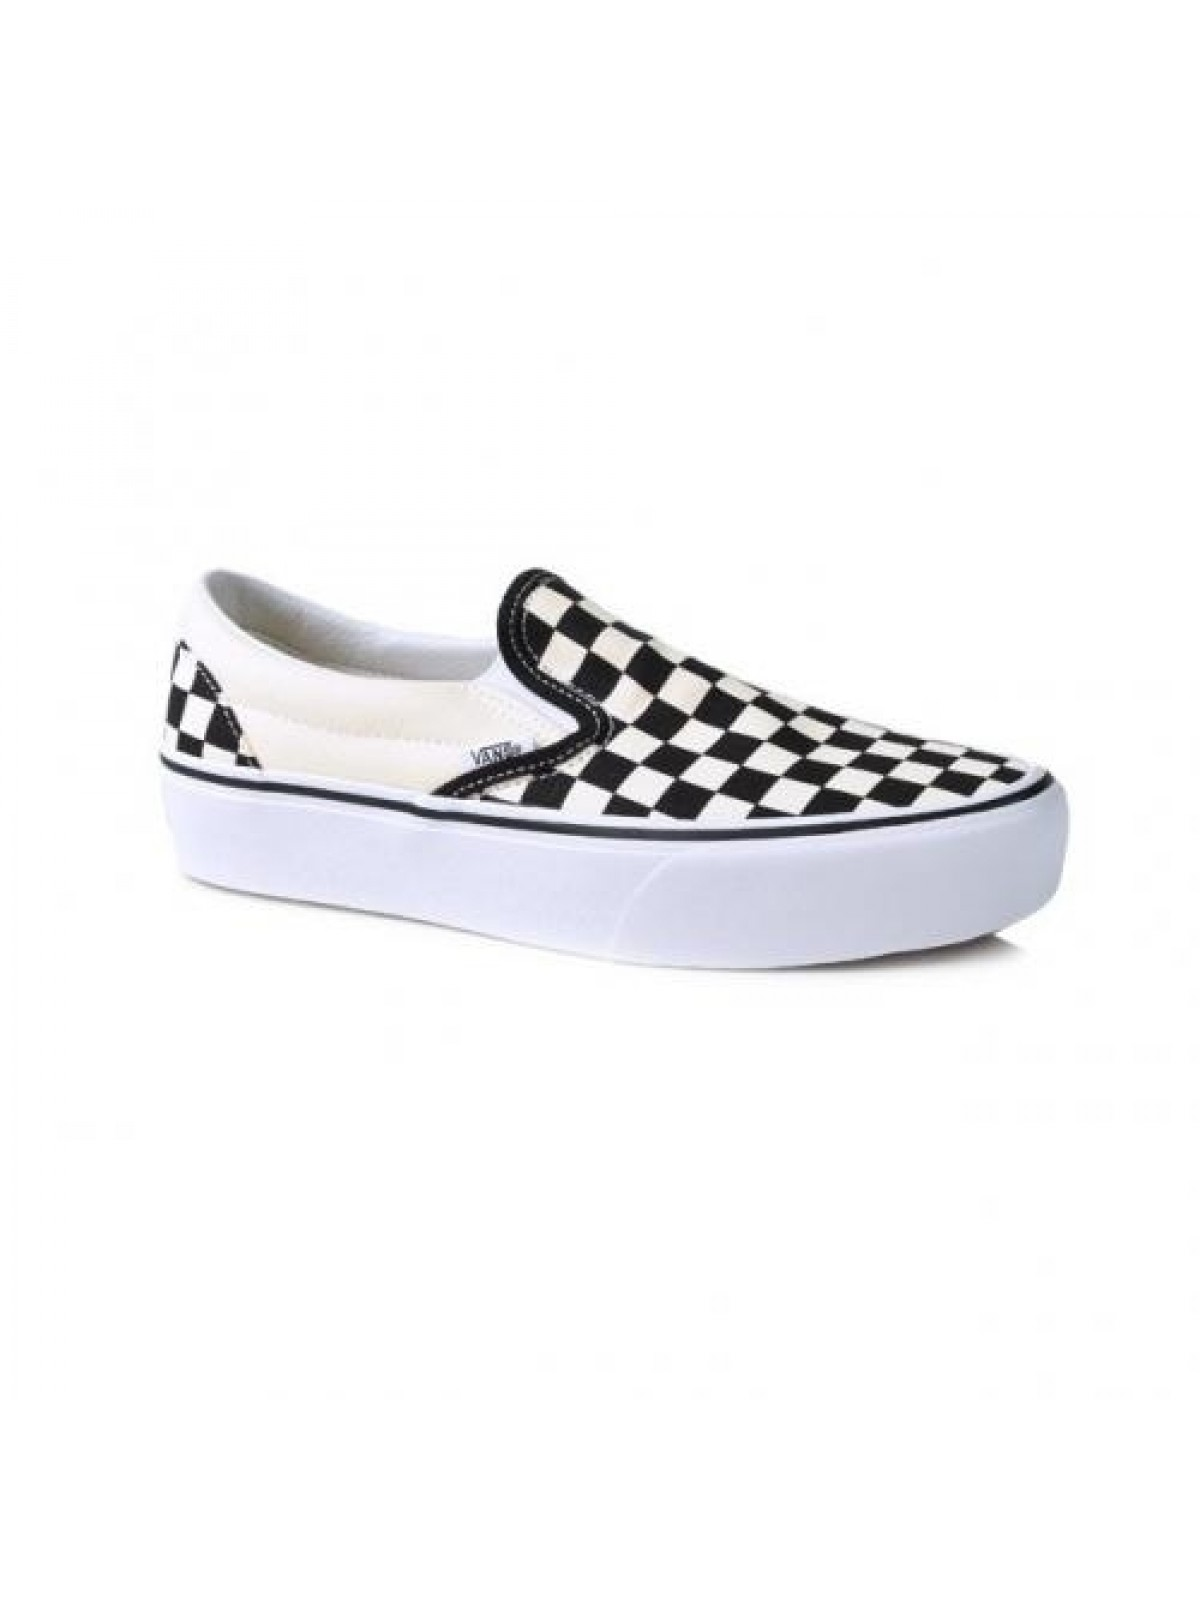 Vans Slipon Plateforme damier noir / blanc - Vans - Marques